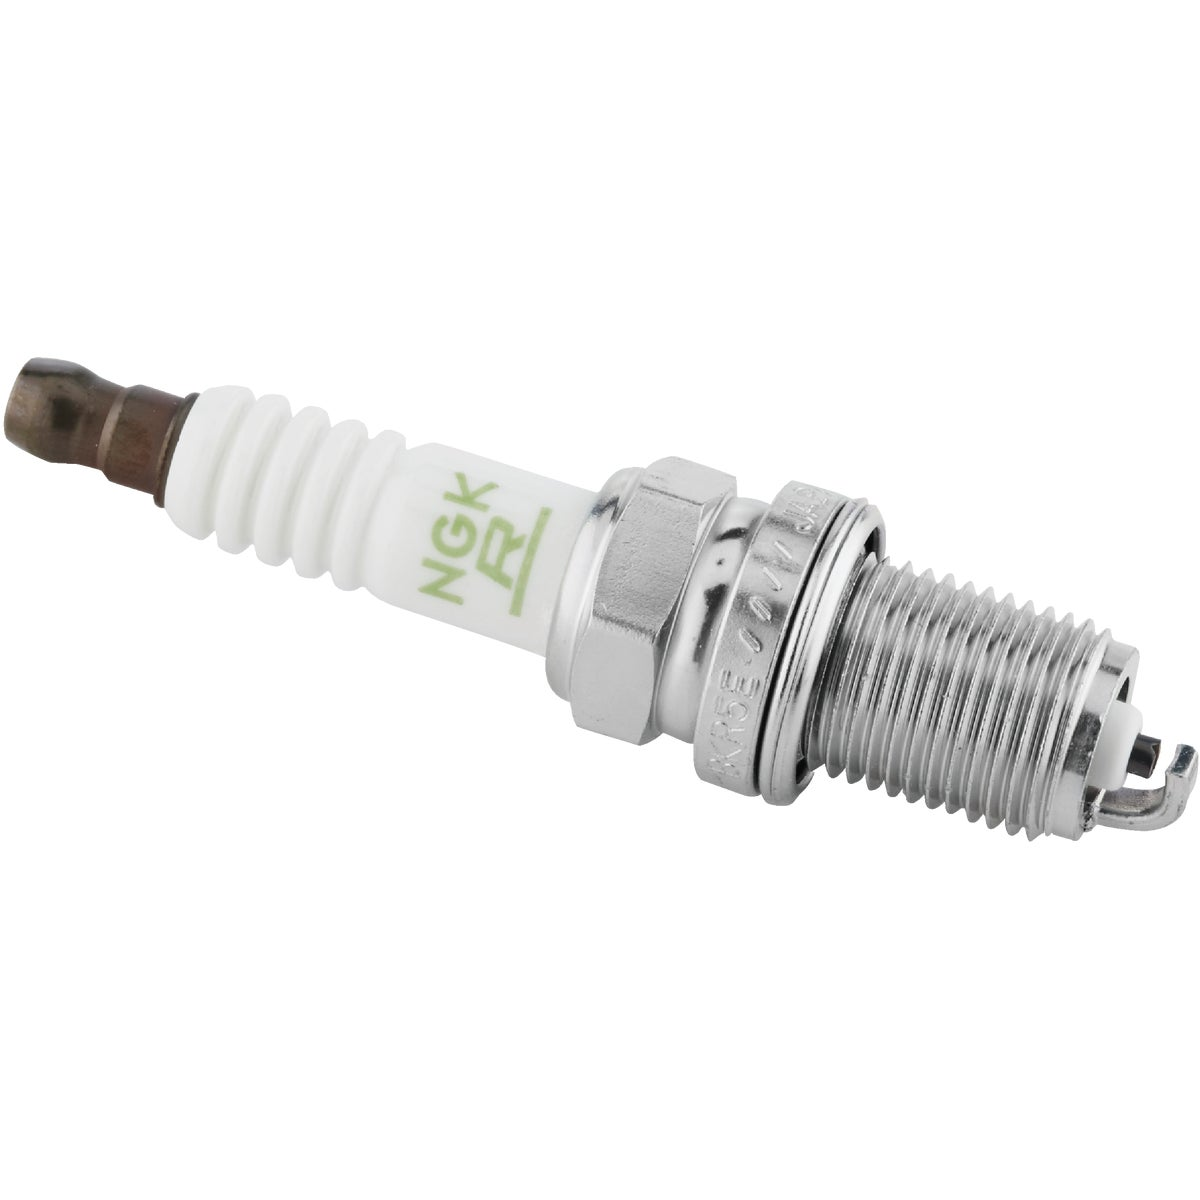 Bkr5E Blyb Spark Plug